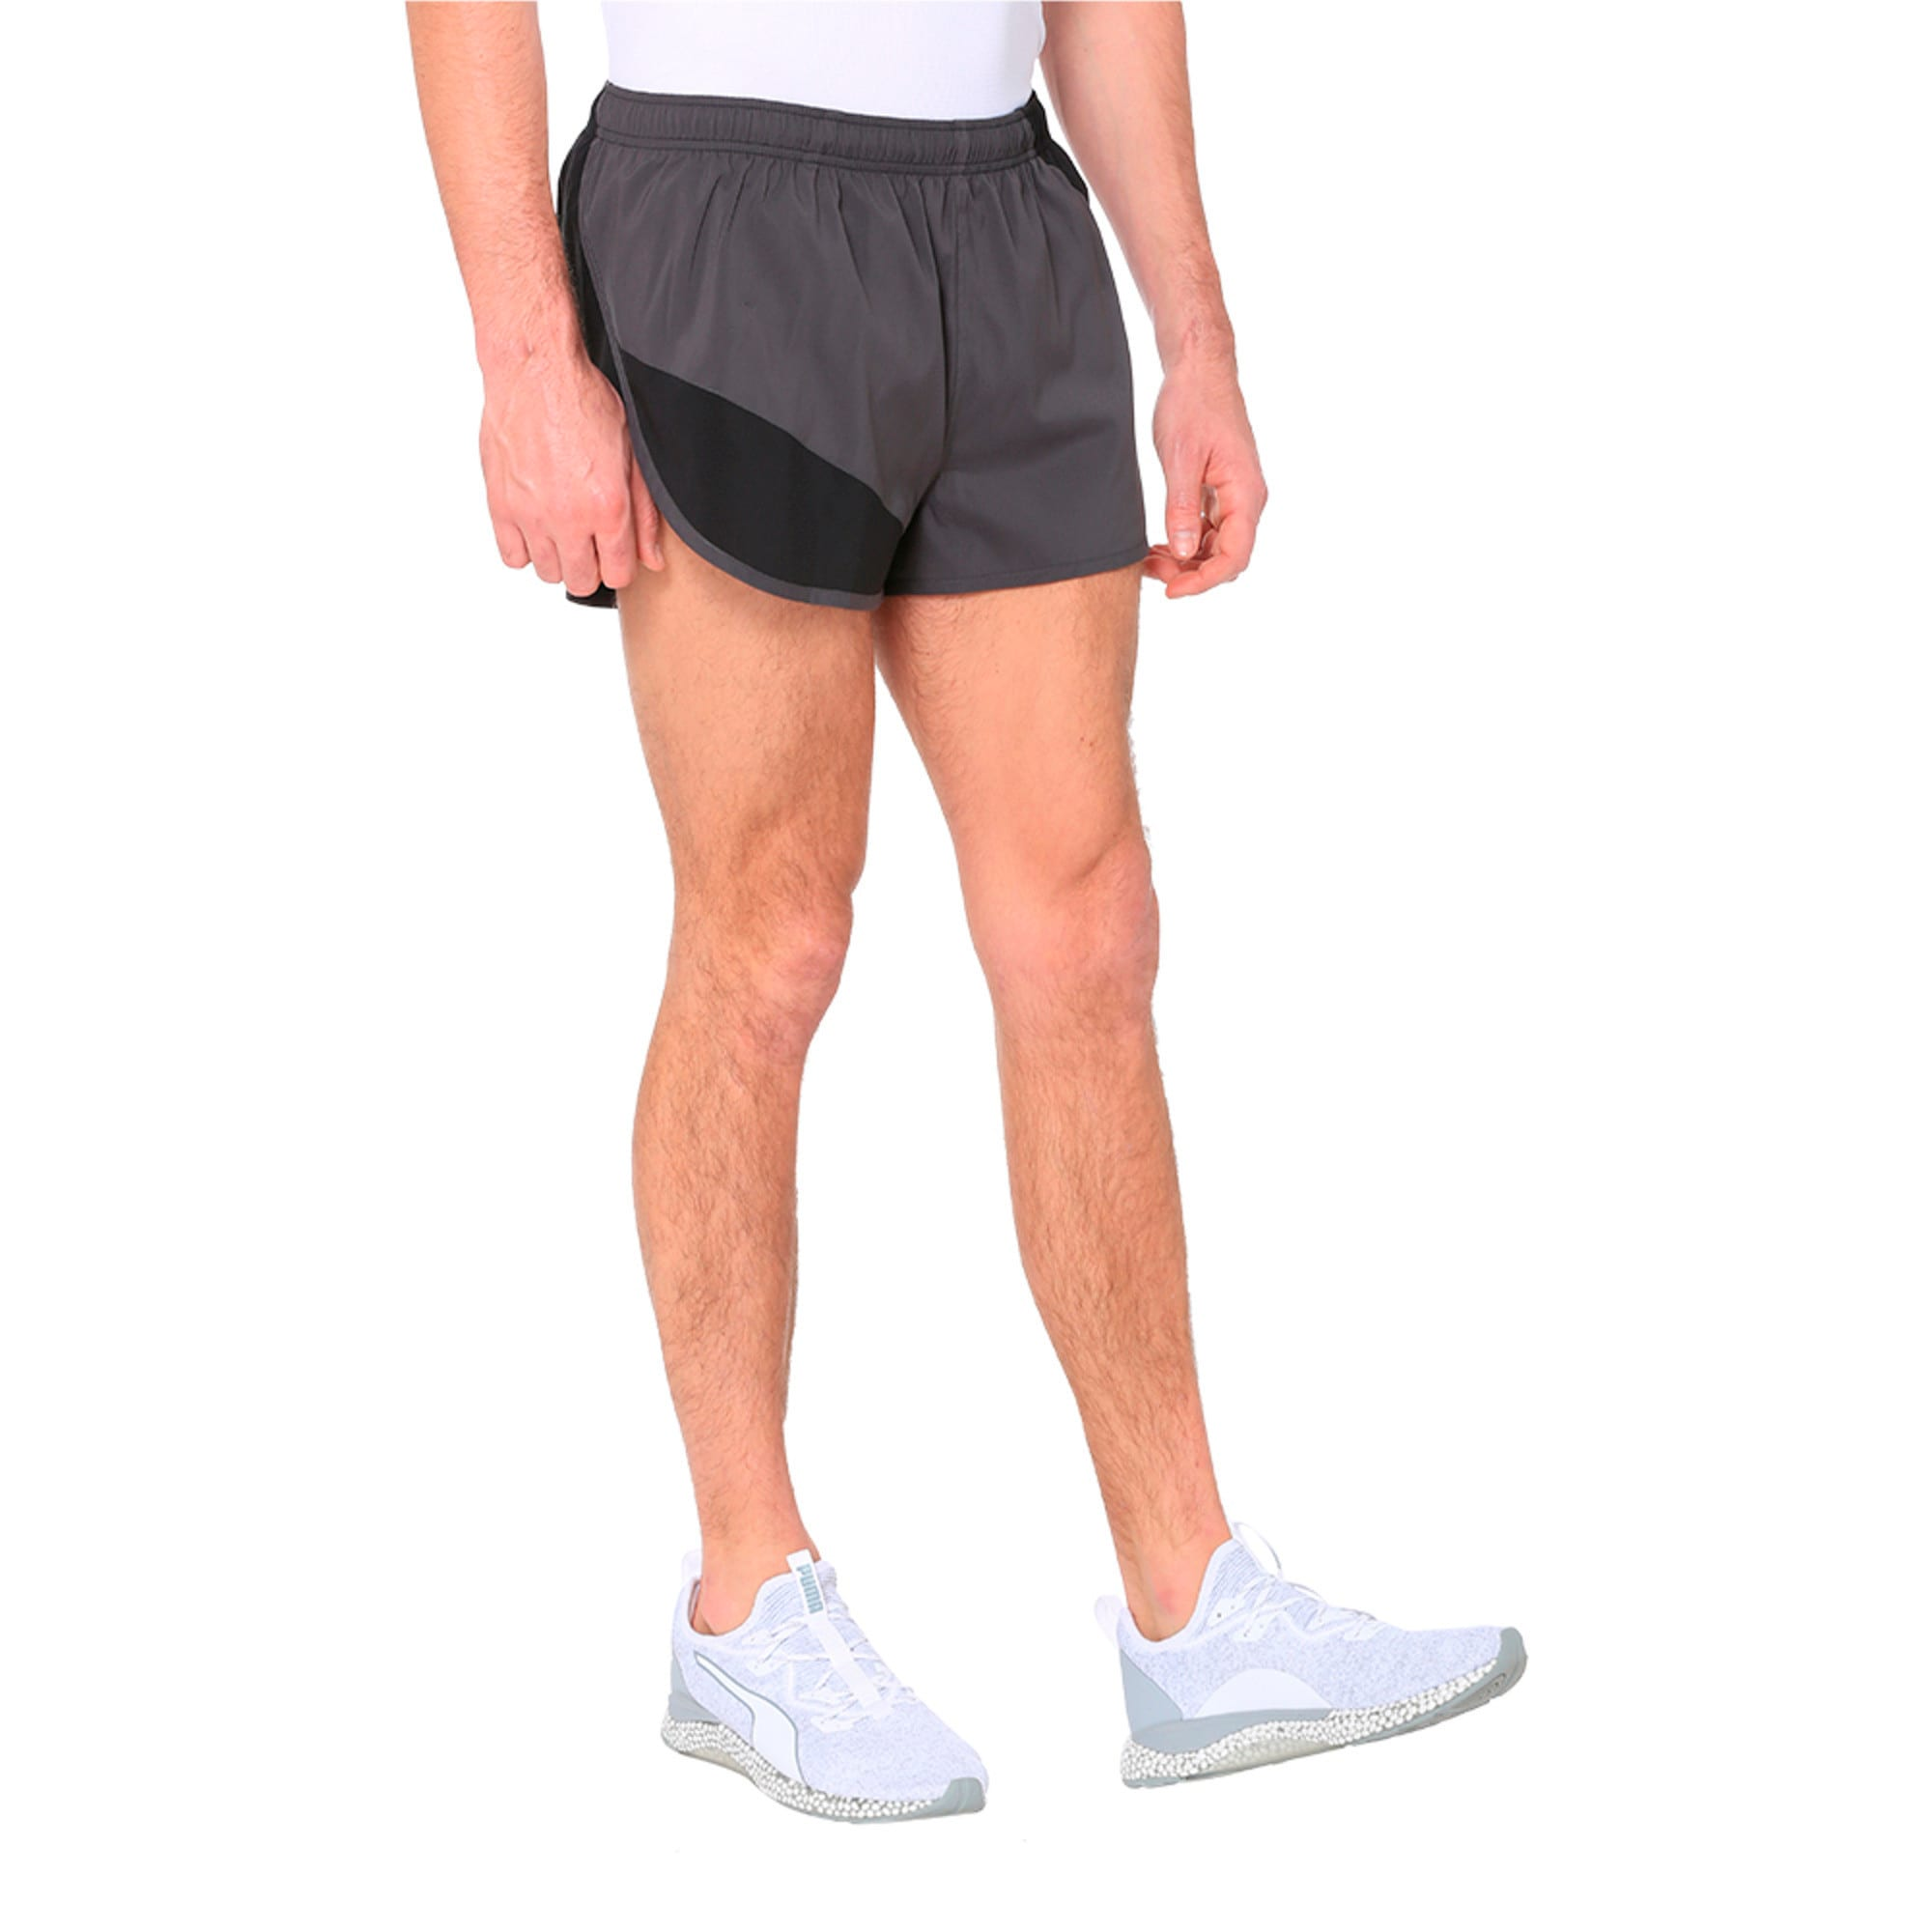 Thumbnail 2 of IGNITE Men's Running Split Shorts, Puma Black-Asphalt, medium-IND